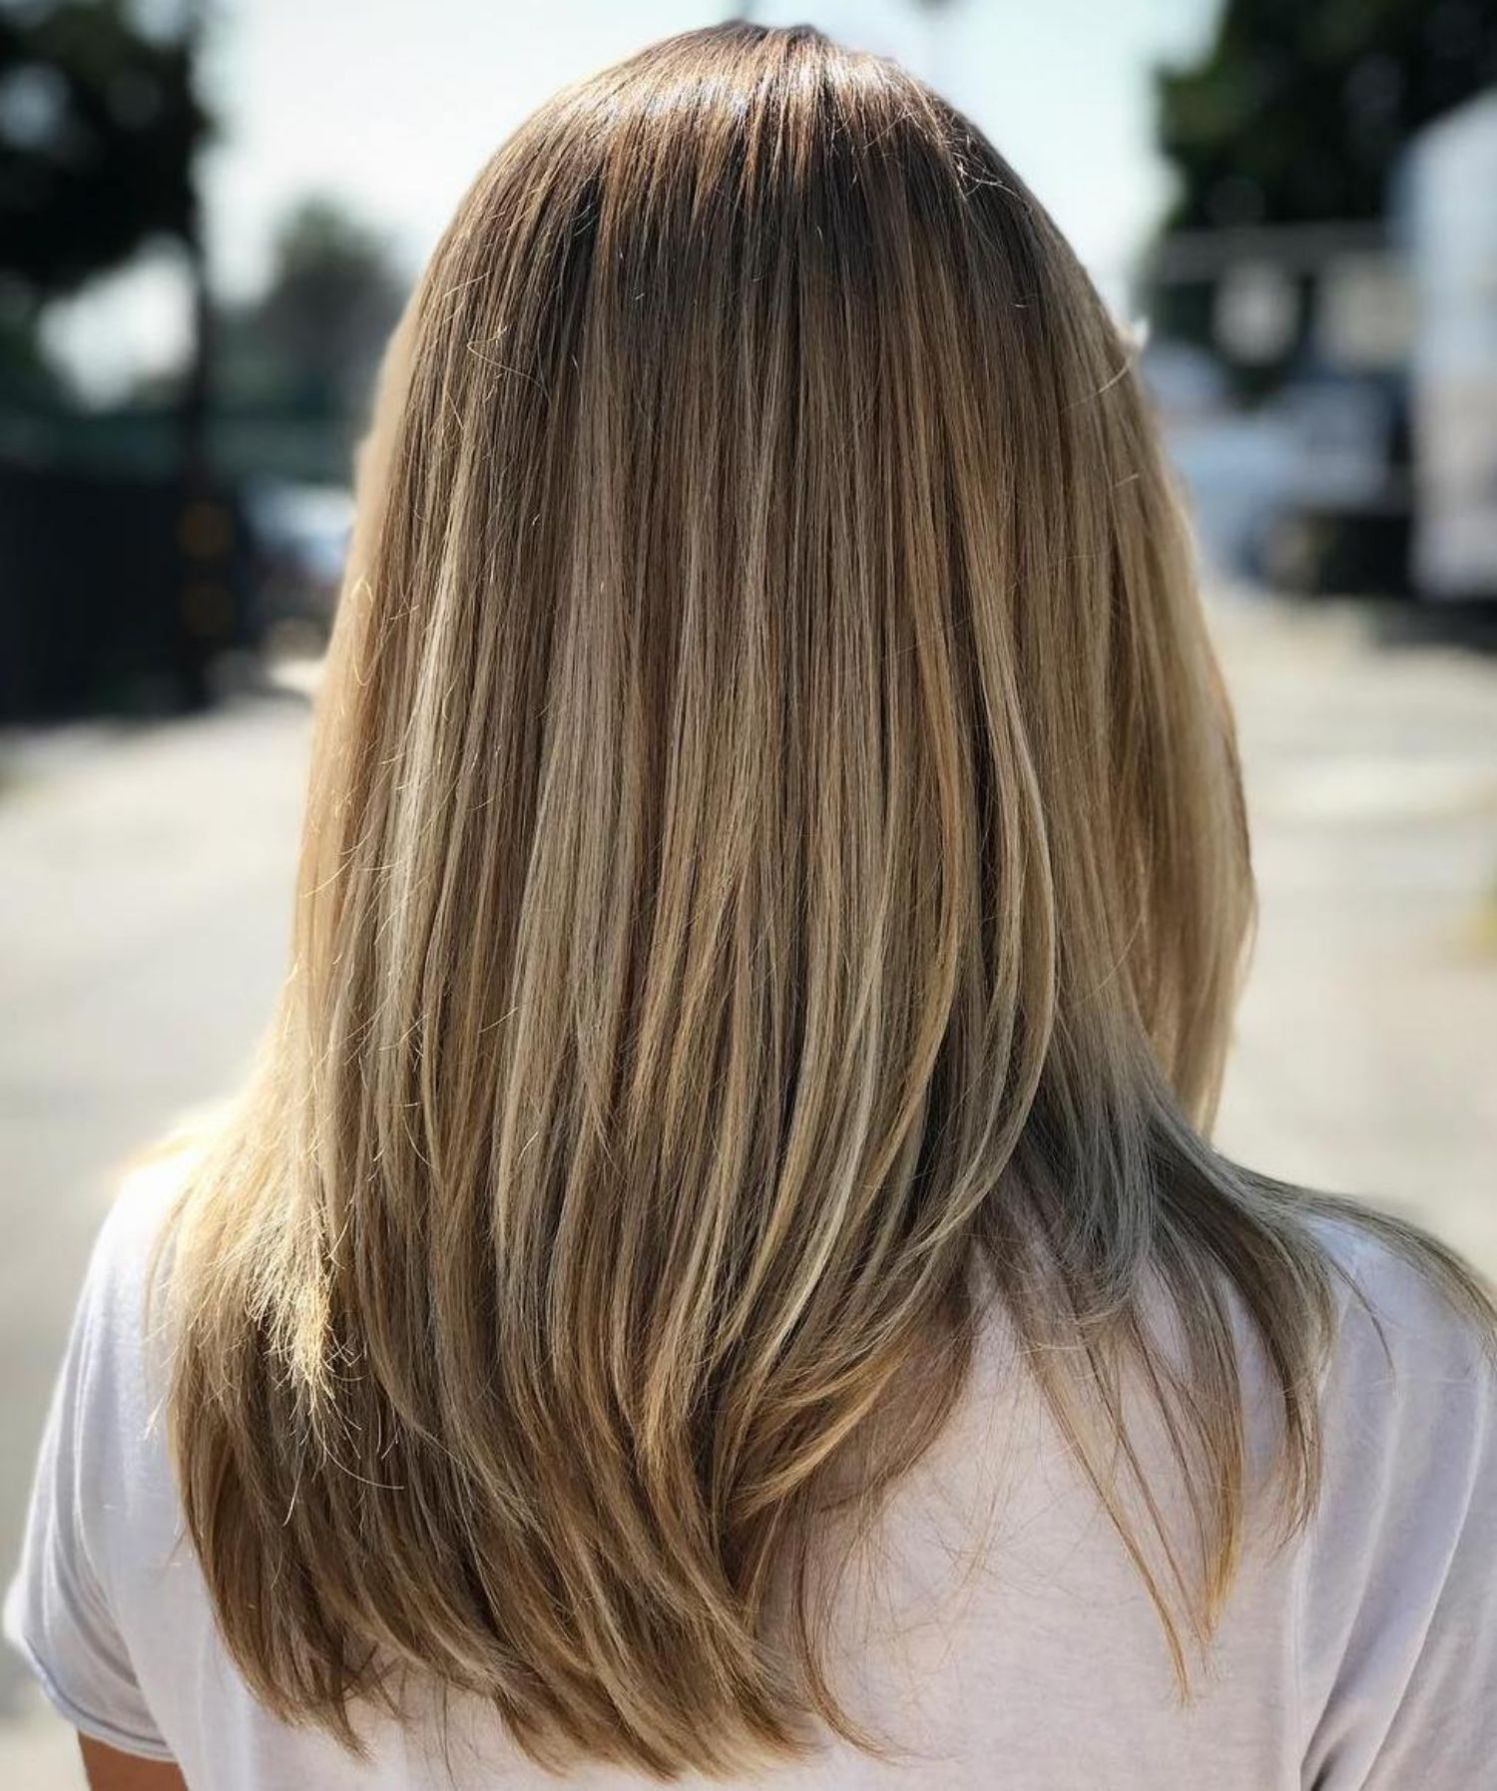 40 Long Hairstyles and Haircuts for Fine Hair | Long layered haircuts, Haircuts straight hair ...